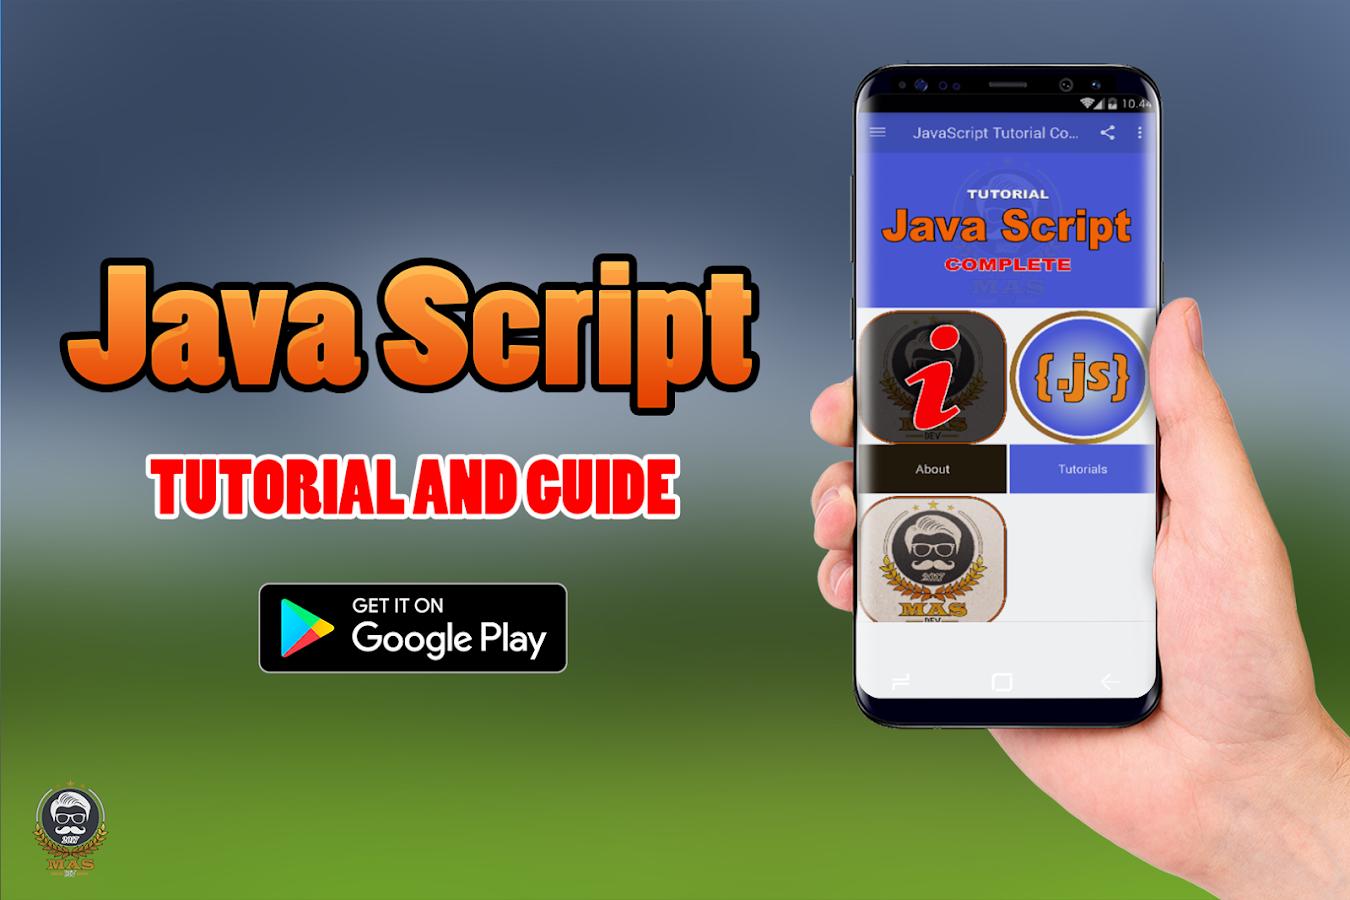 Javascript tutorial complete android apps on google play javascript tutorial complete screenshot baditri Images